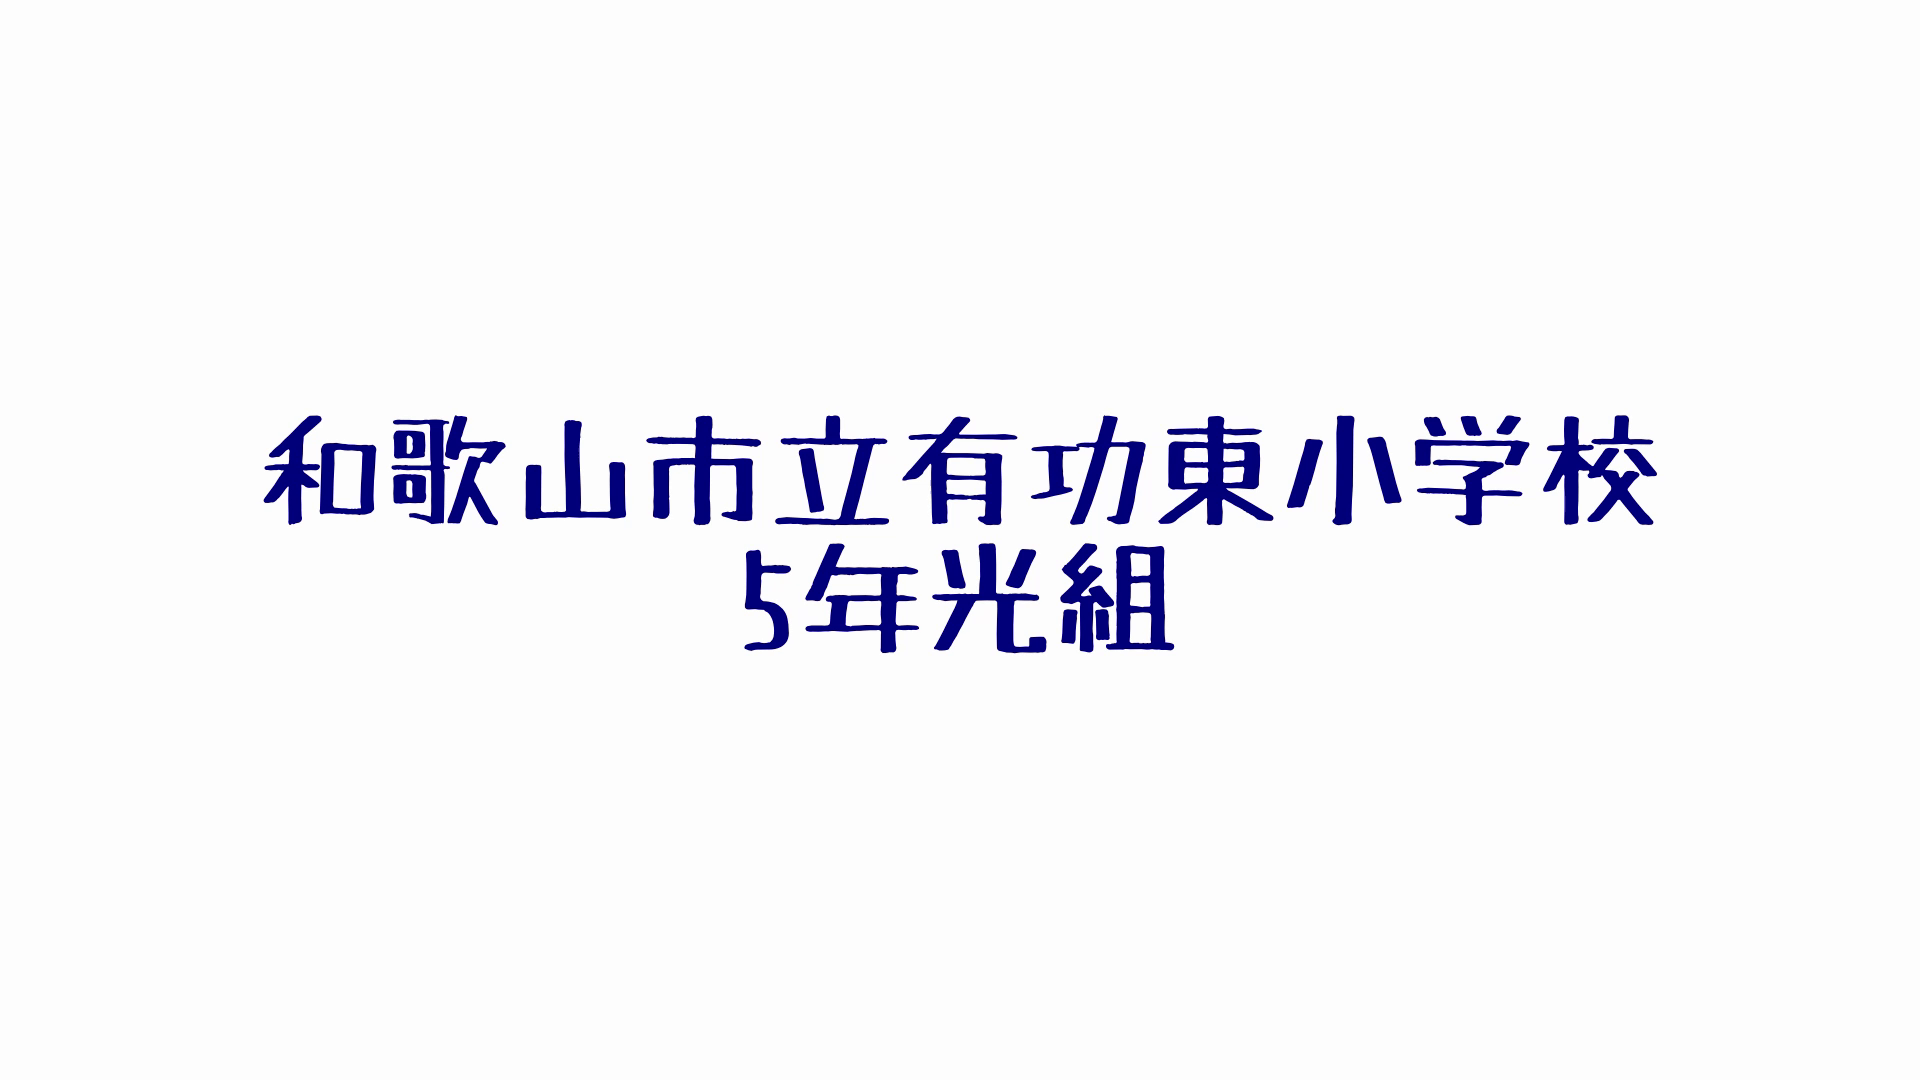 program title